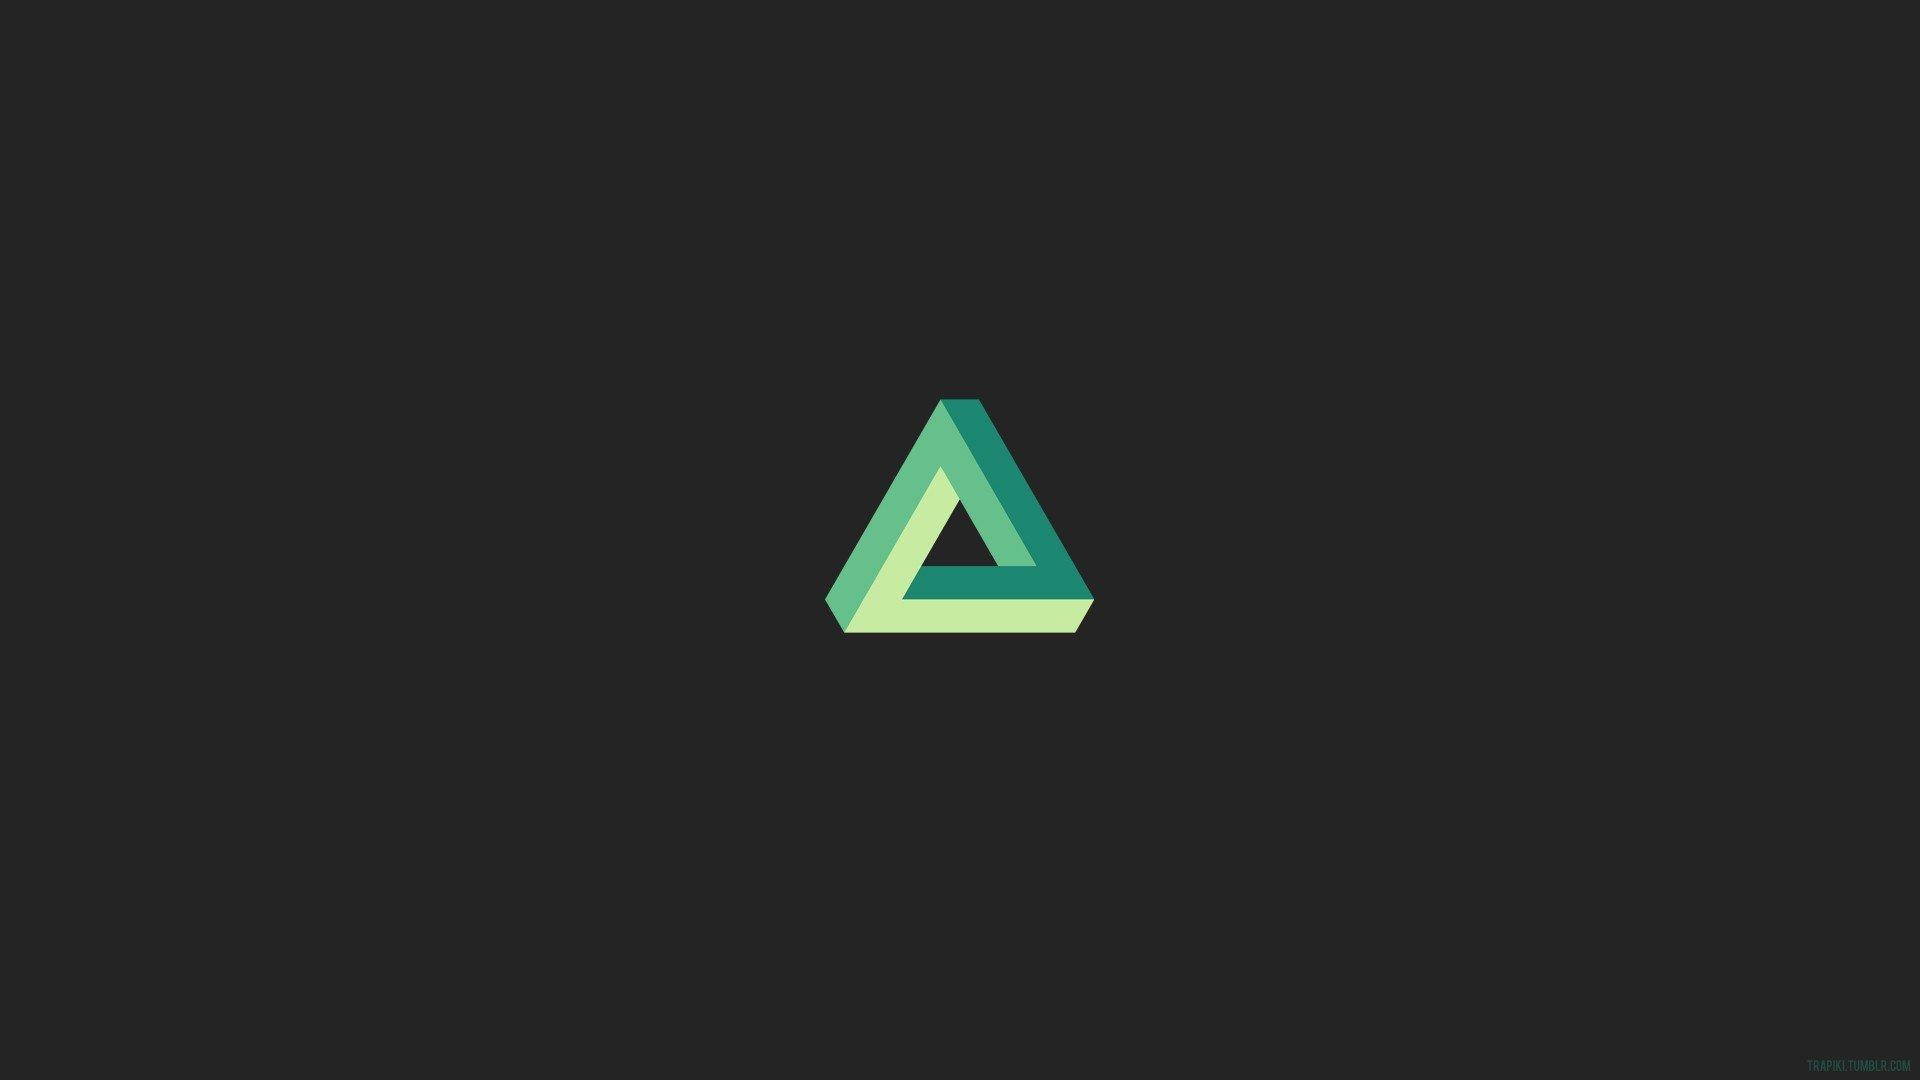 Penrose triangle, Triangle, Minimalism, Gray HD Wallpapers ...